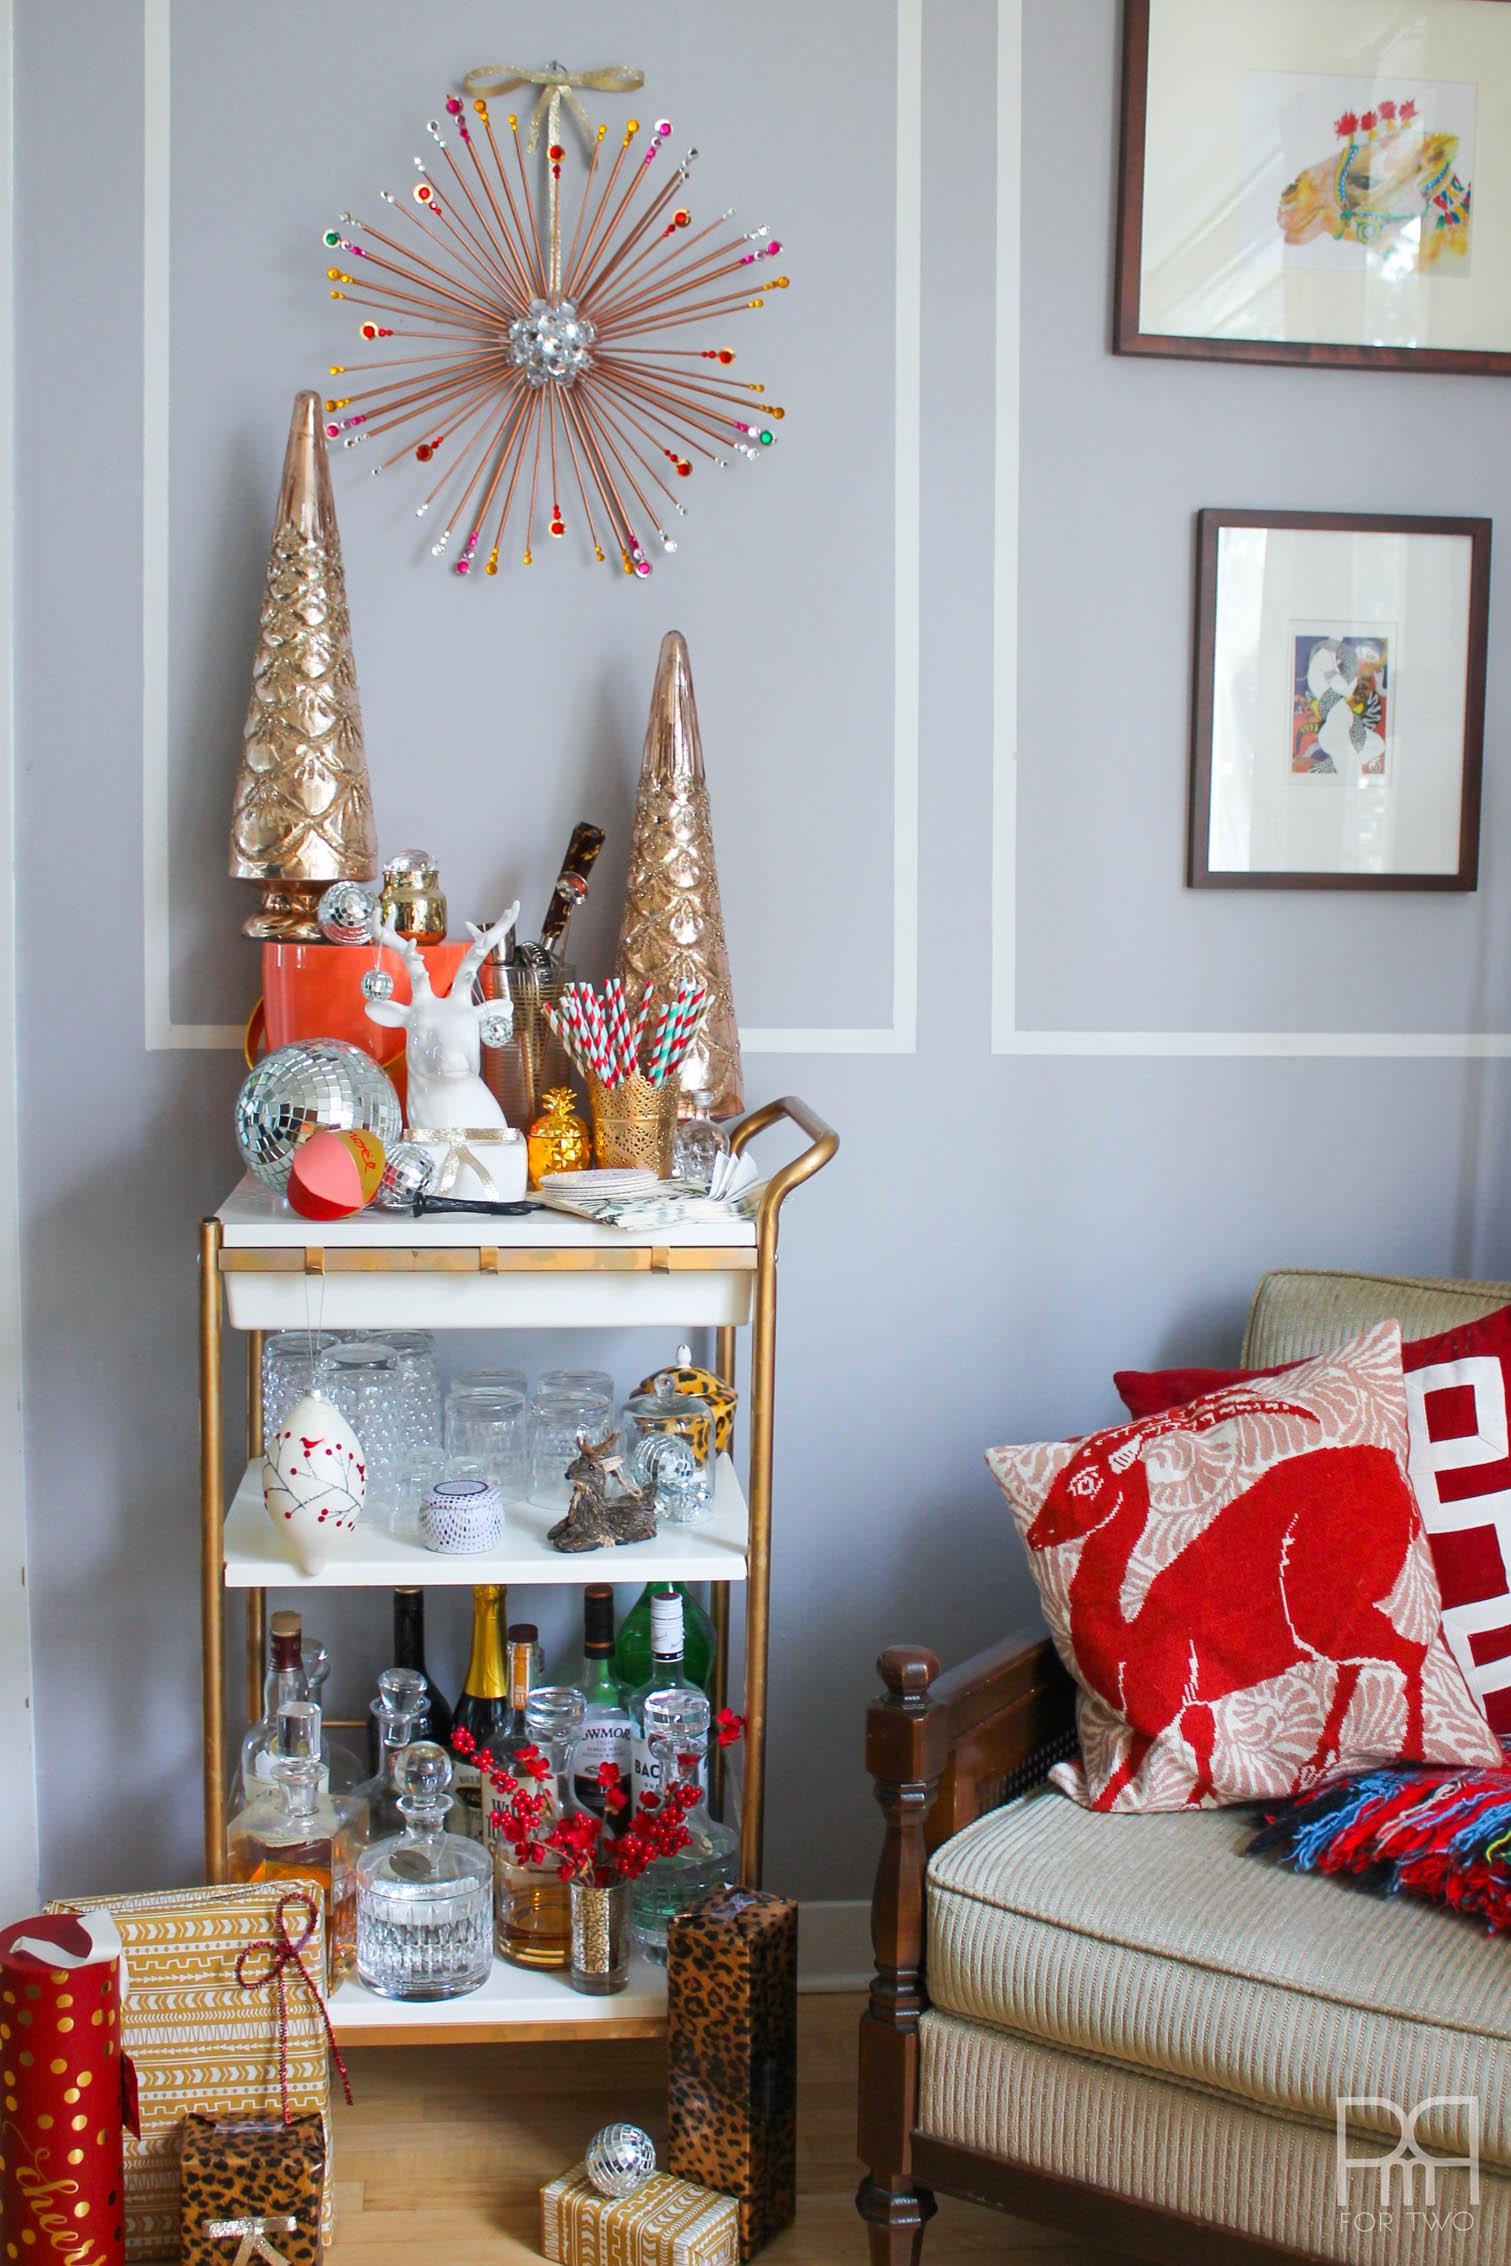 DIY Starburst Wreath living room